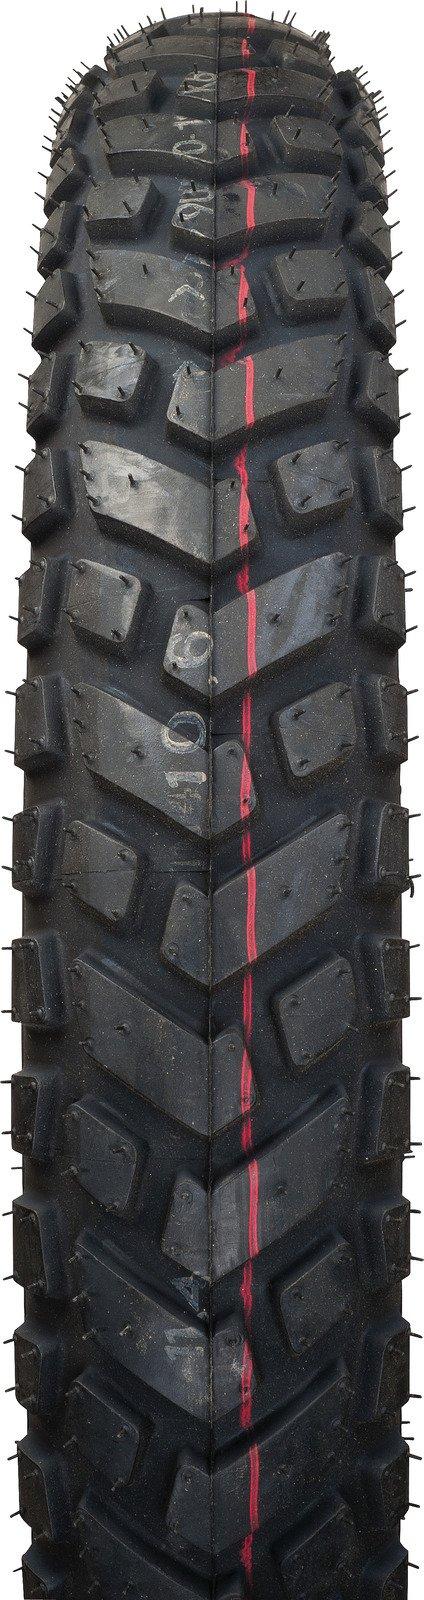 Heidenau K60 Enduro Front Tyre 90/90-18 51S TT  61000